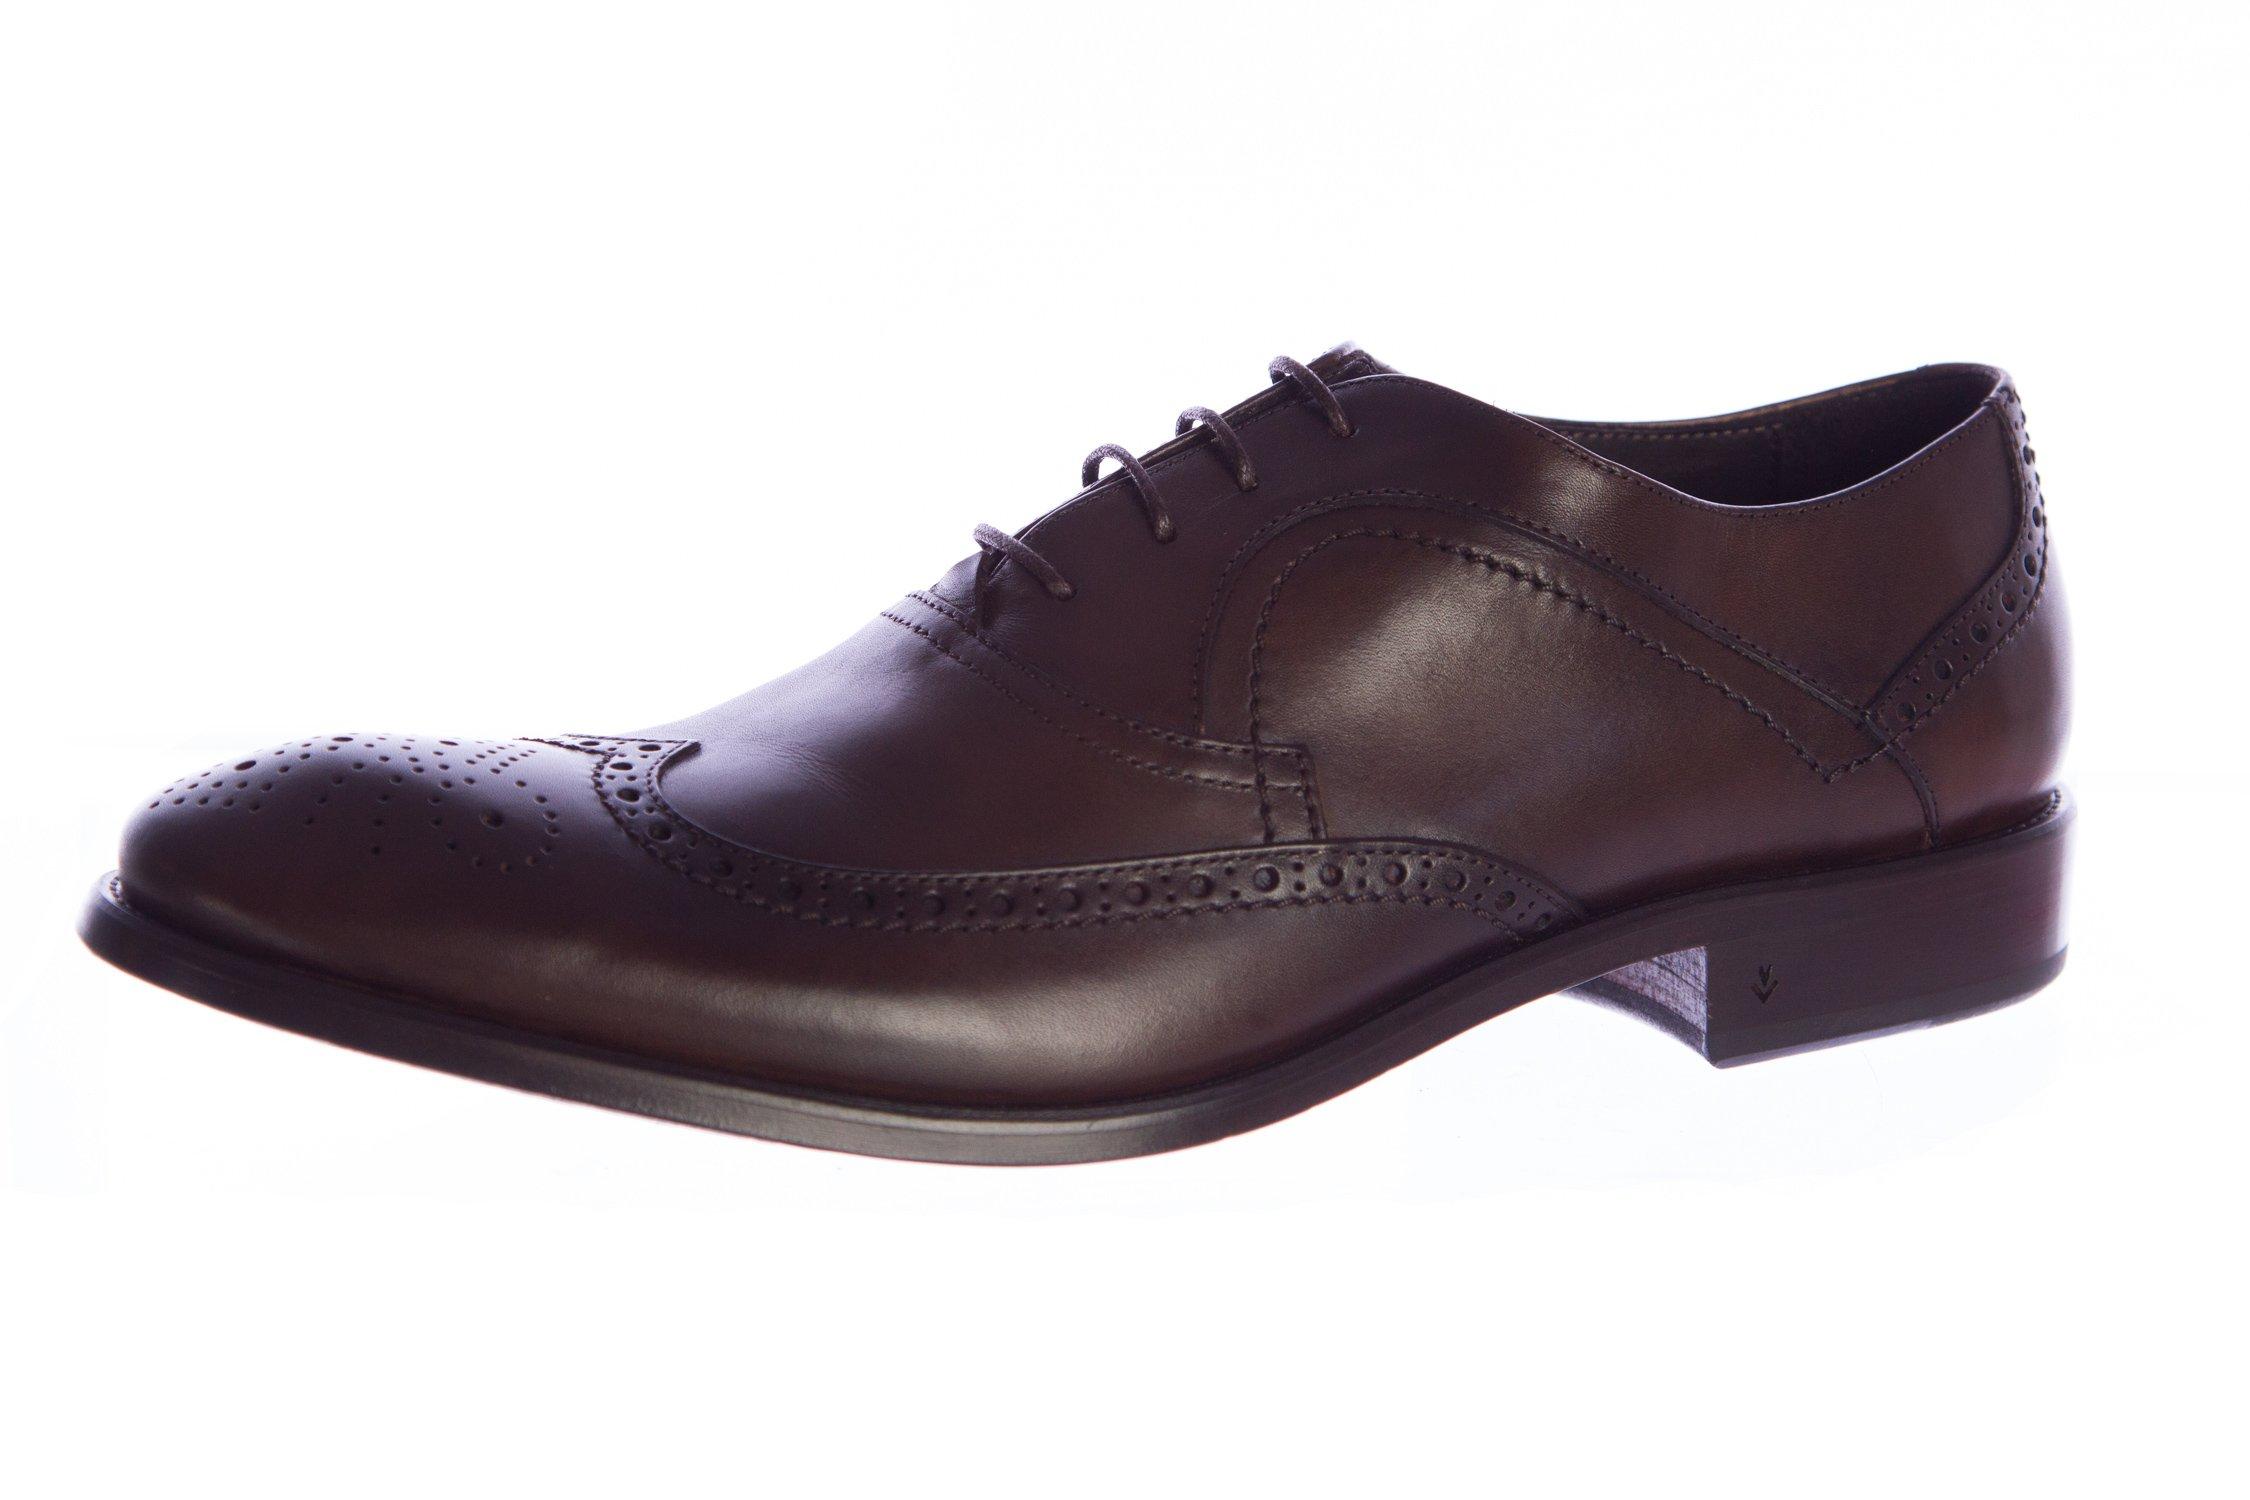 John Varvatos Men's Leather Richards Wingtip Oxfords 11.5 Espresso